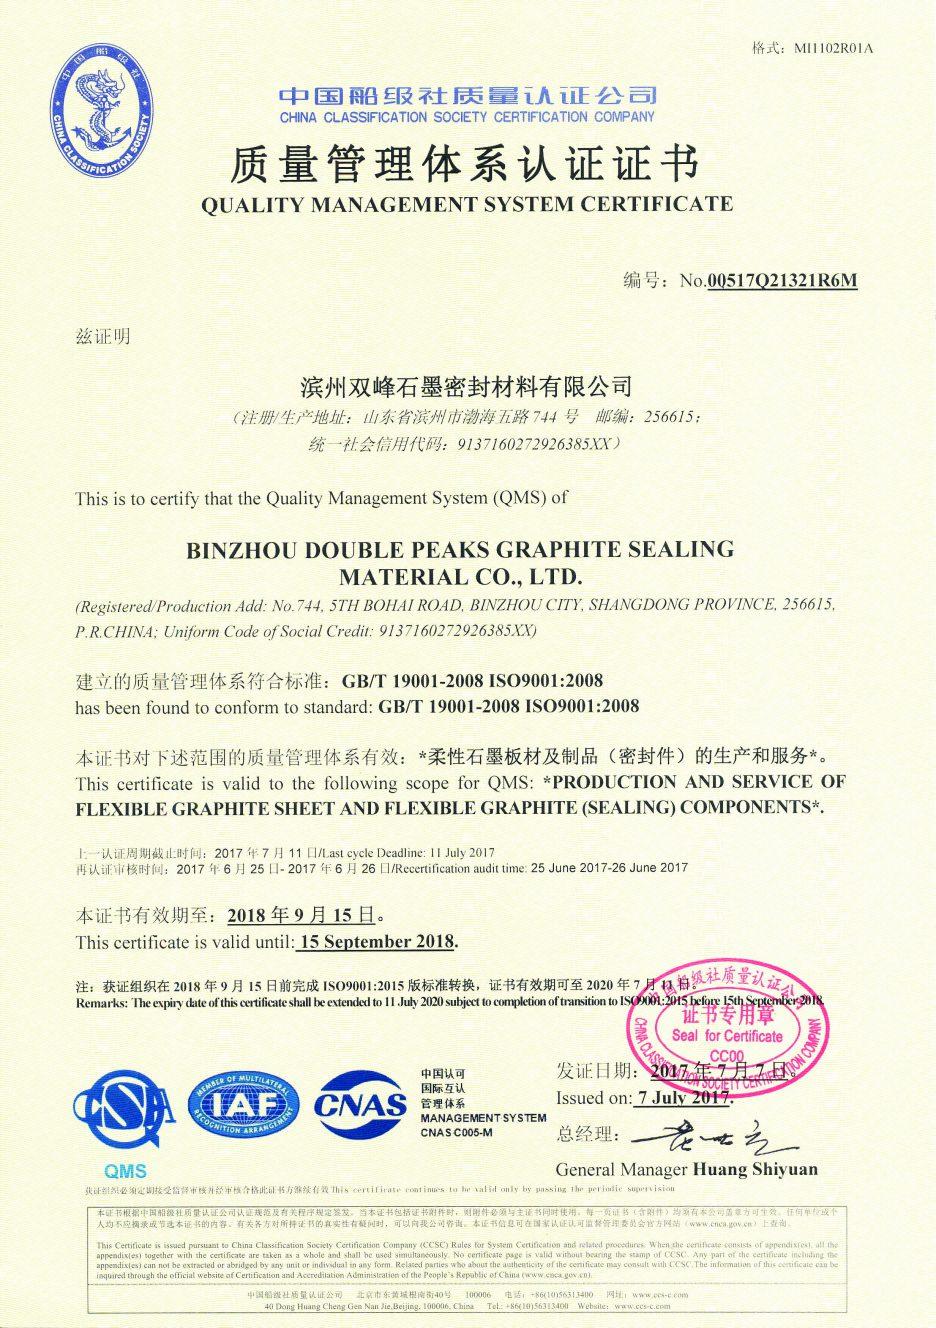 质量管理系统体系认证证书 Quality Management System Certificate